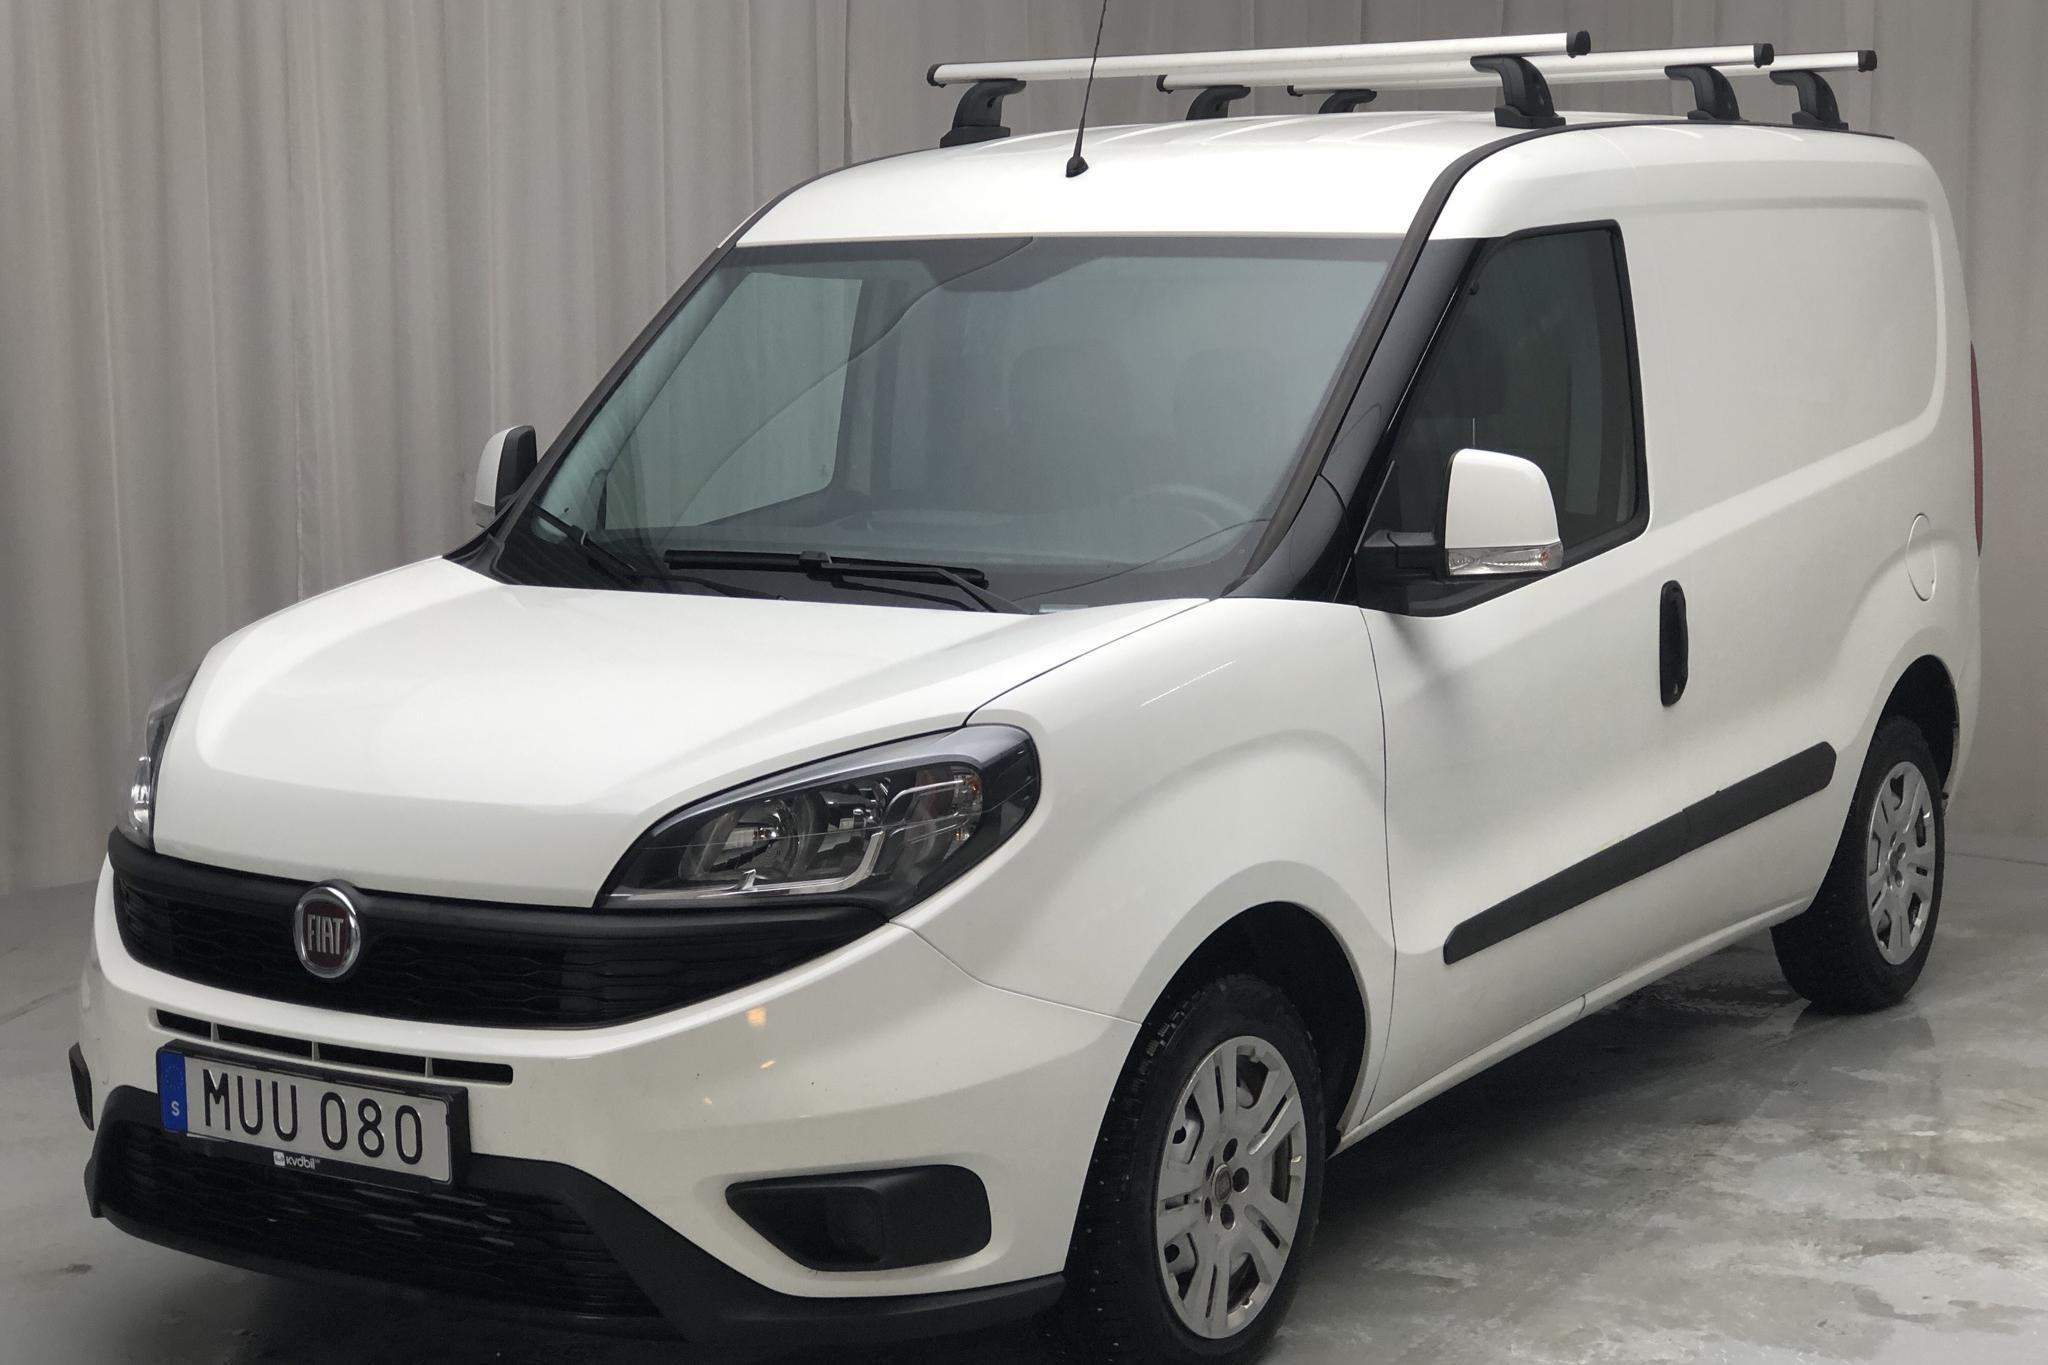 Fiat Doblo Cargo 1.6 MJT (105hk) - 3 451 mil - Manuell - vit - 2019